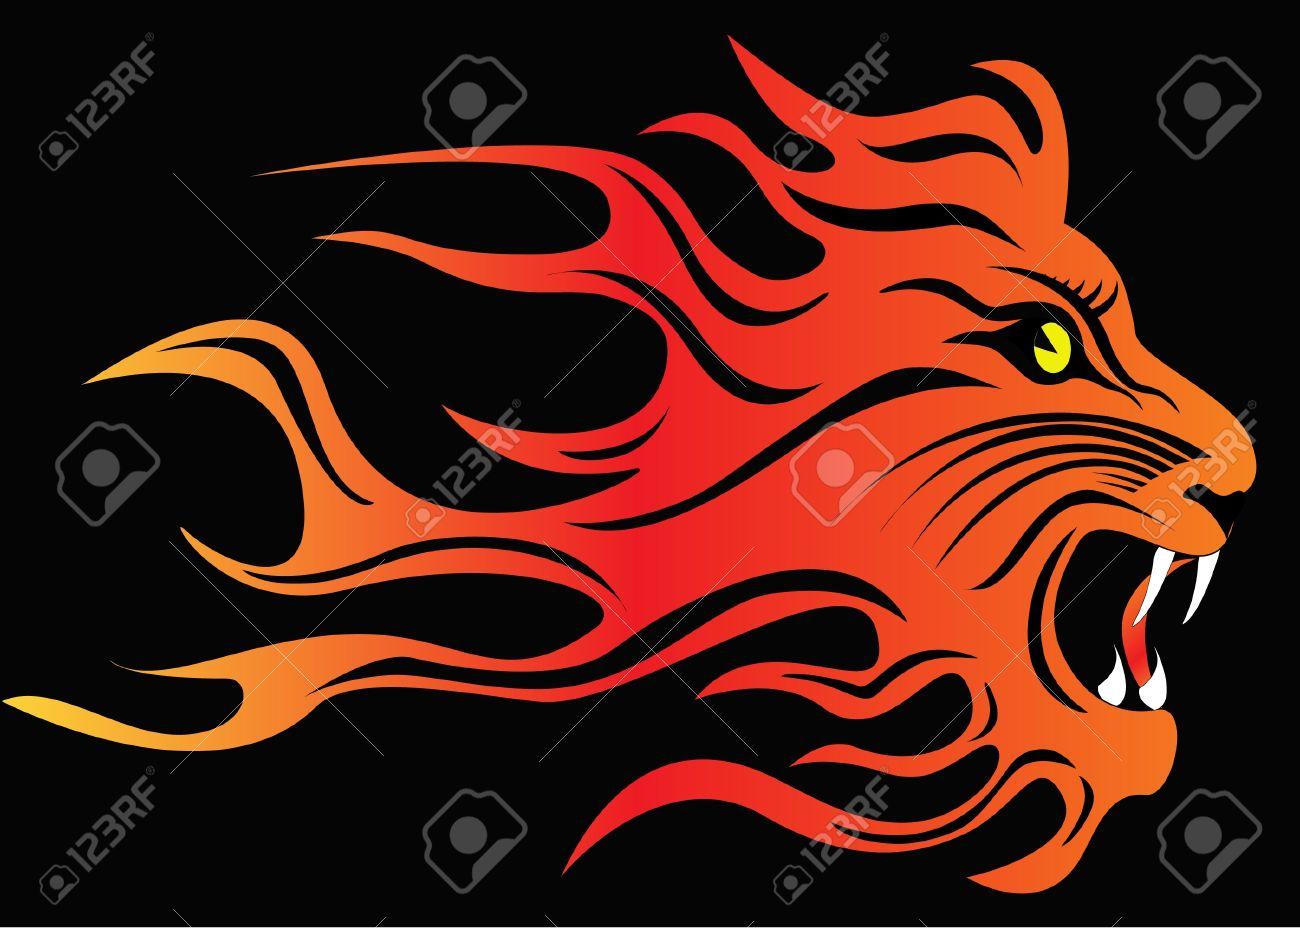 Фото лев в ярости в огне 6